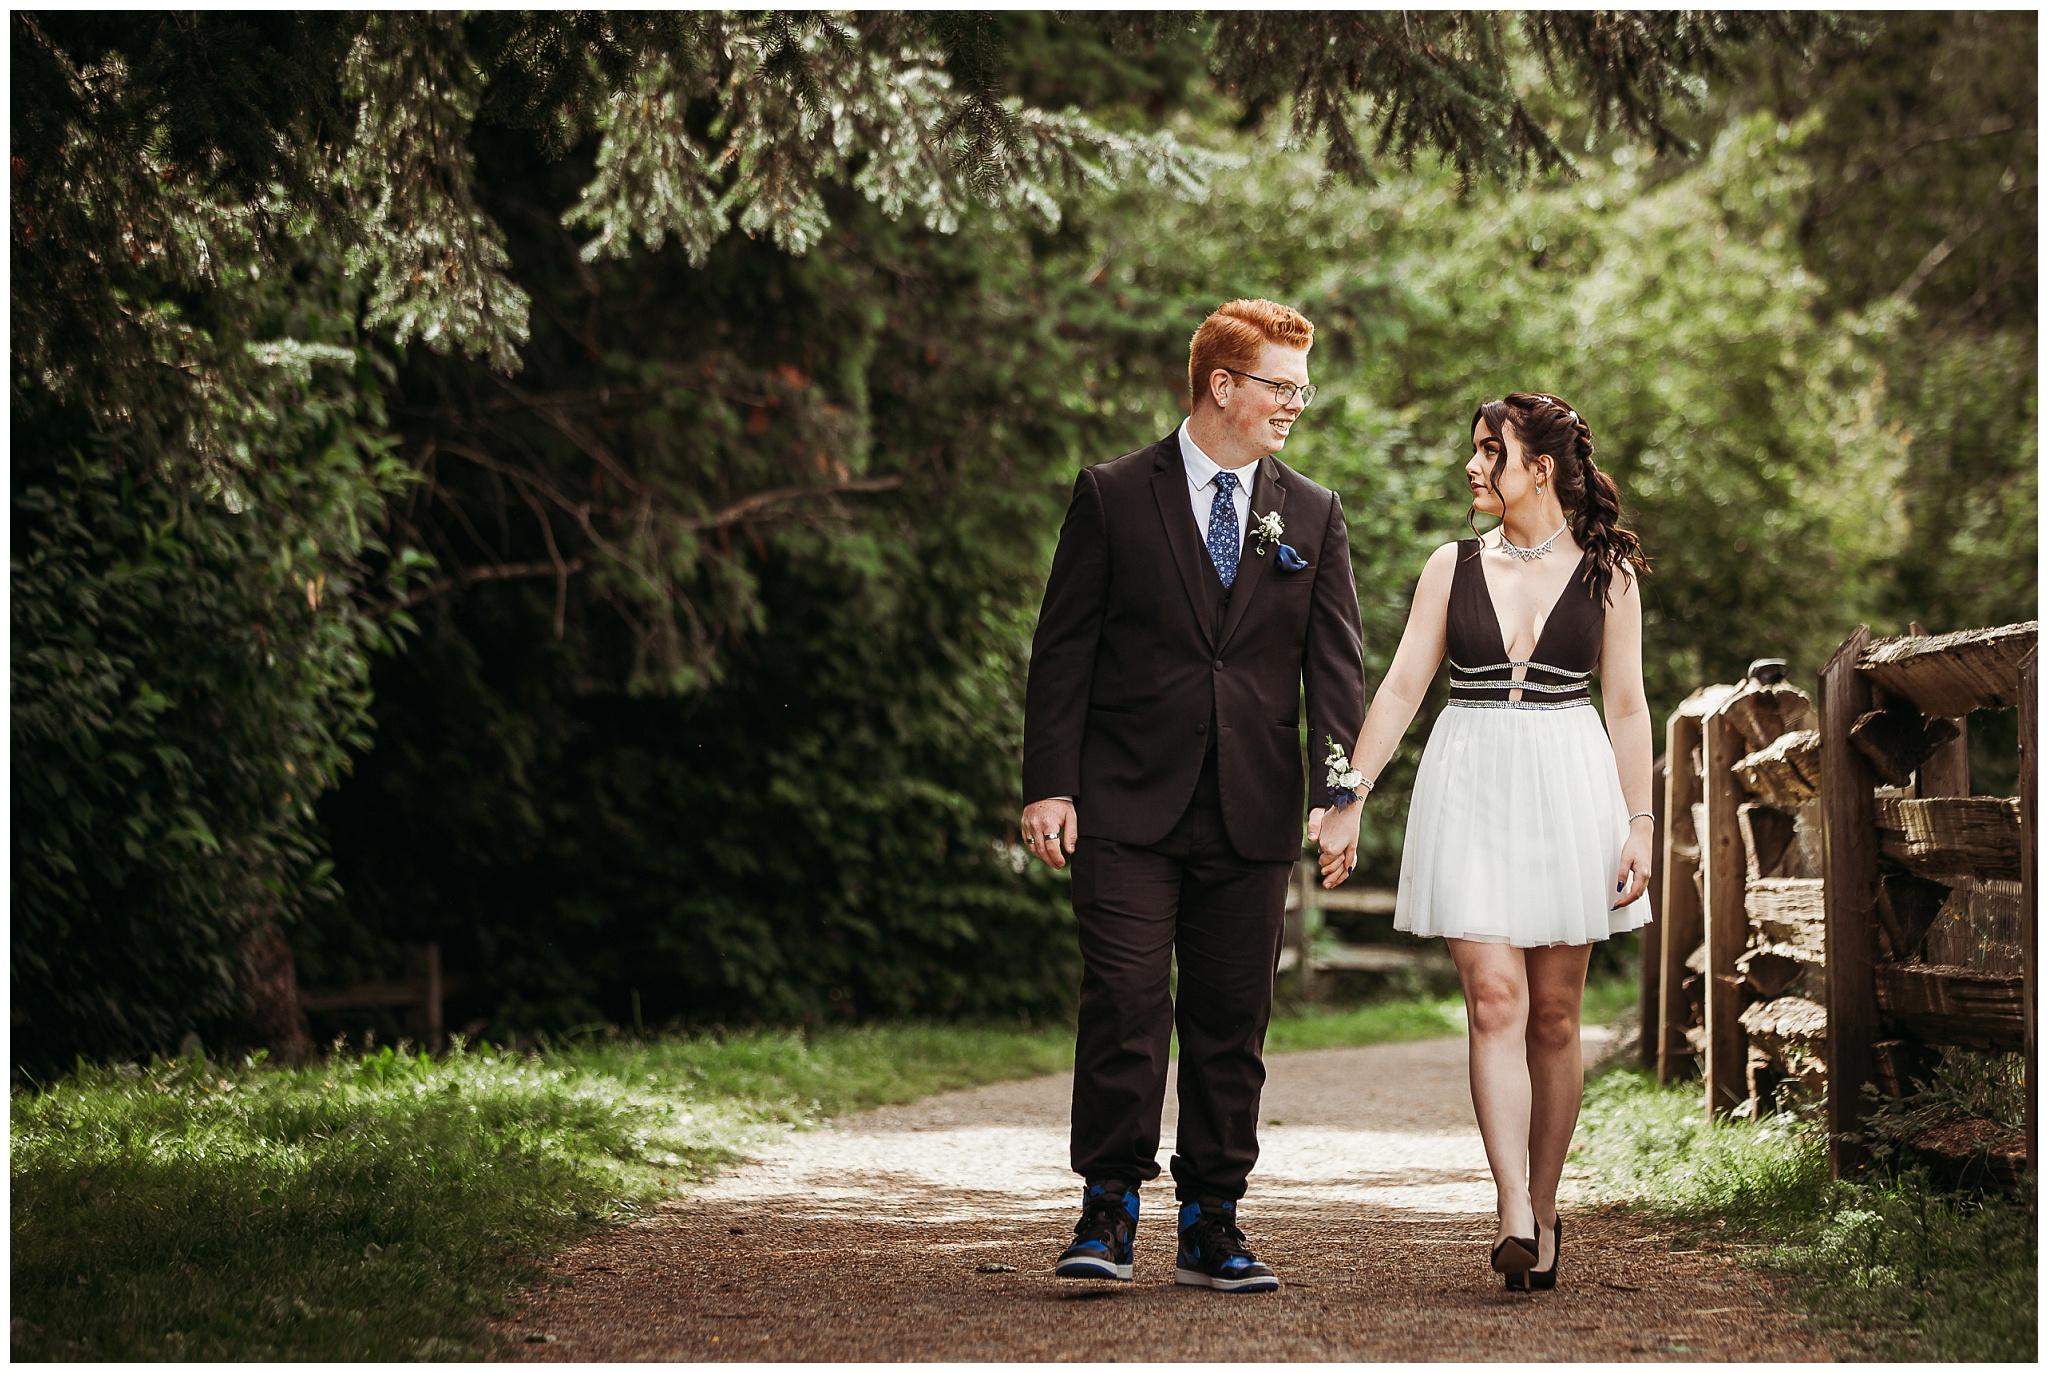 Chilliwack Highschool Prom Graduation Photographer 2019 Abbotsford fun bright_0007.jpg